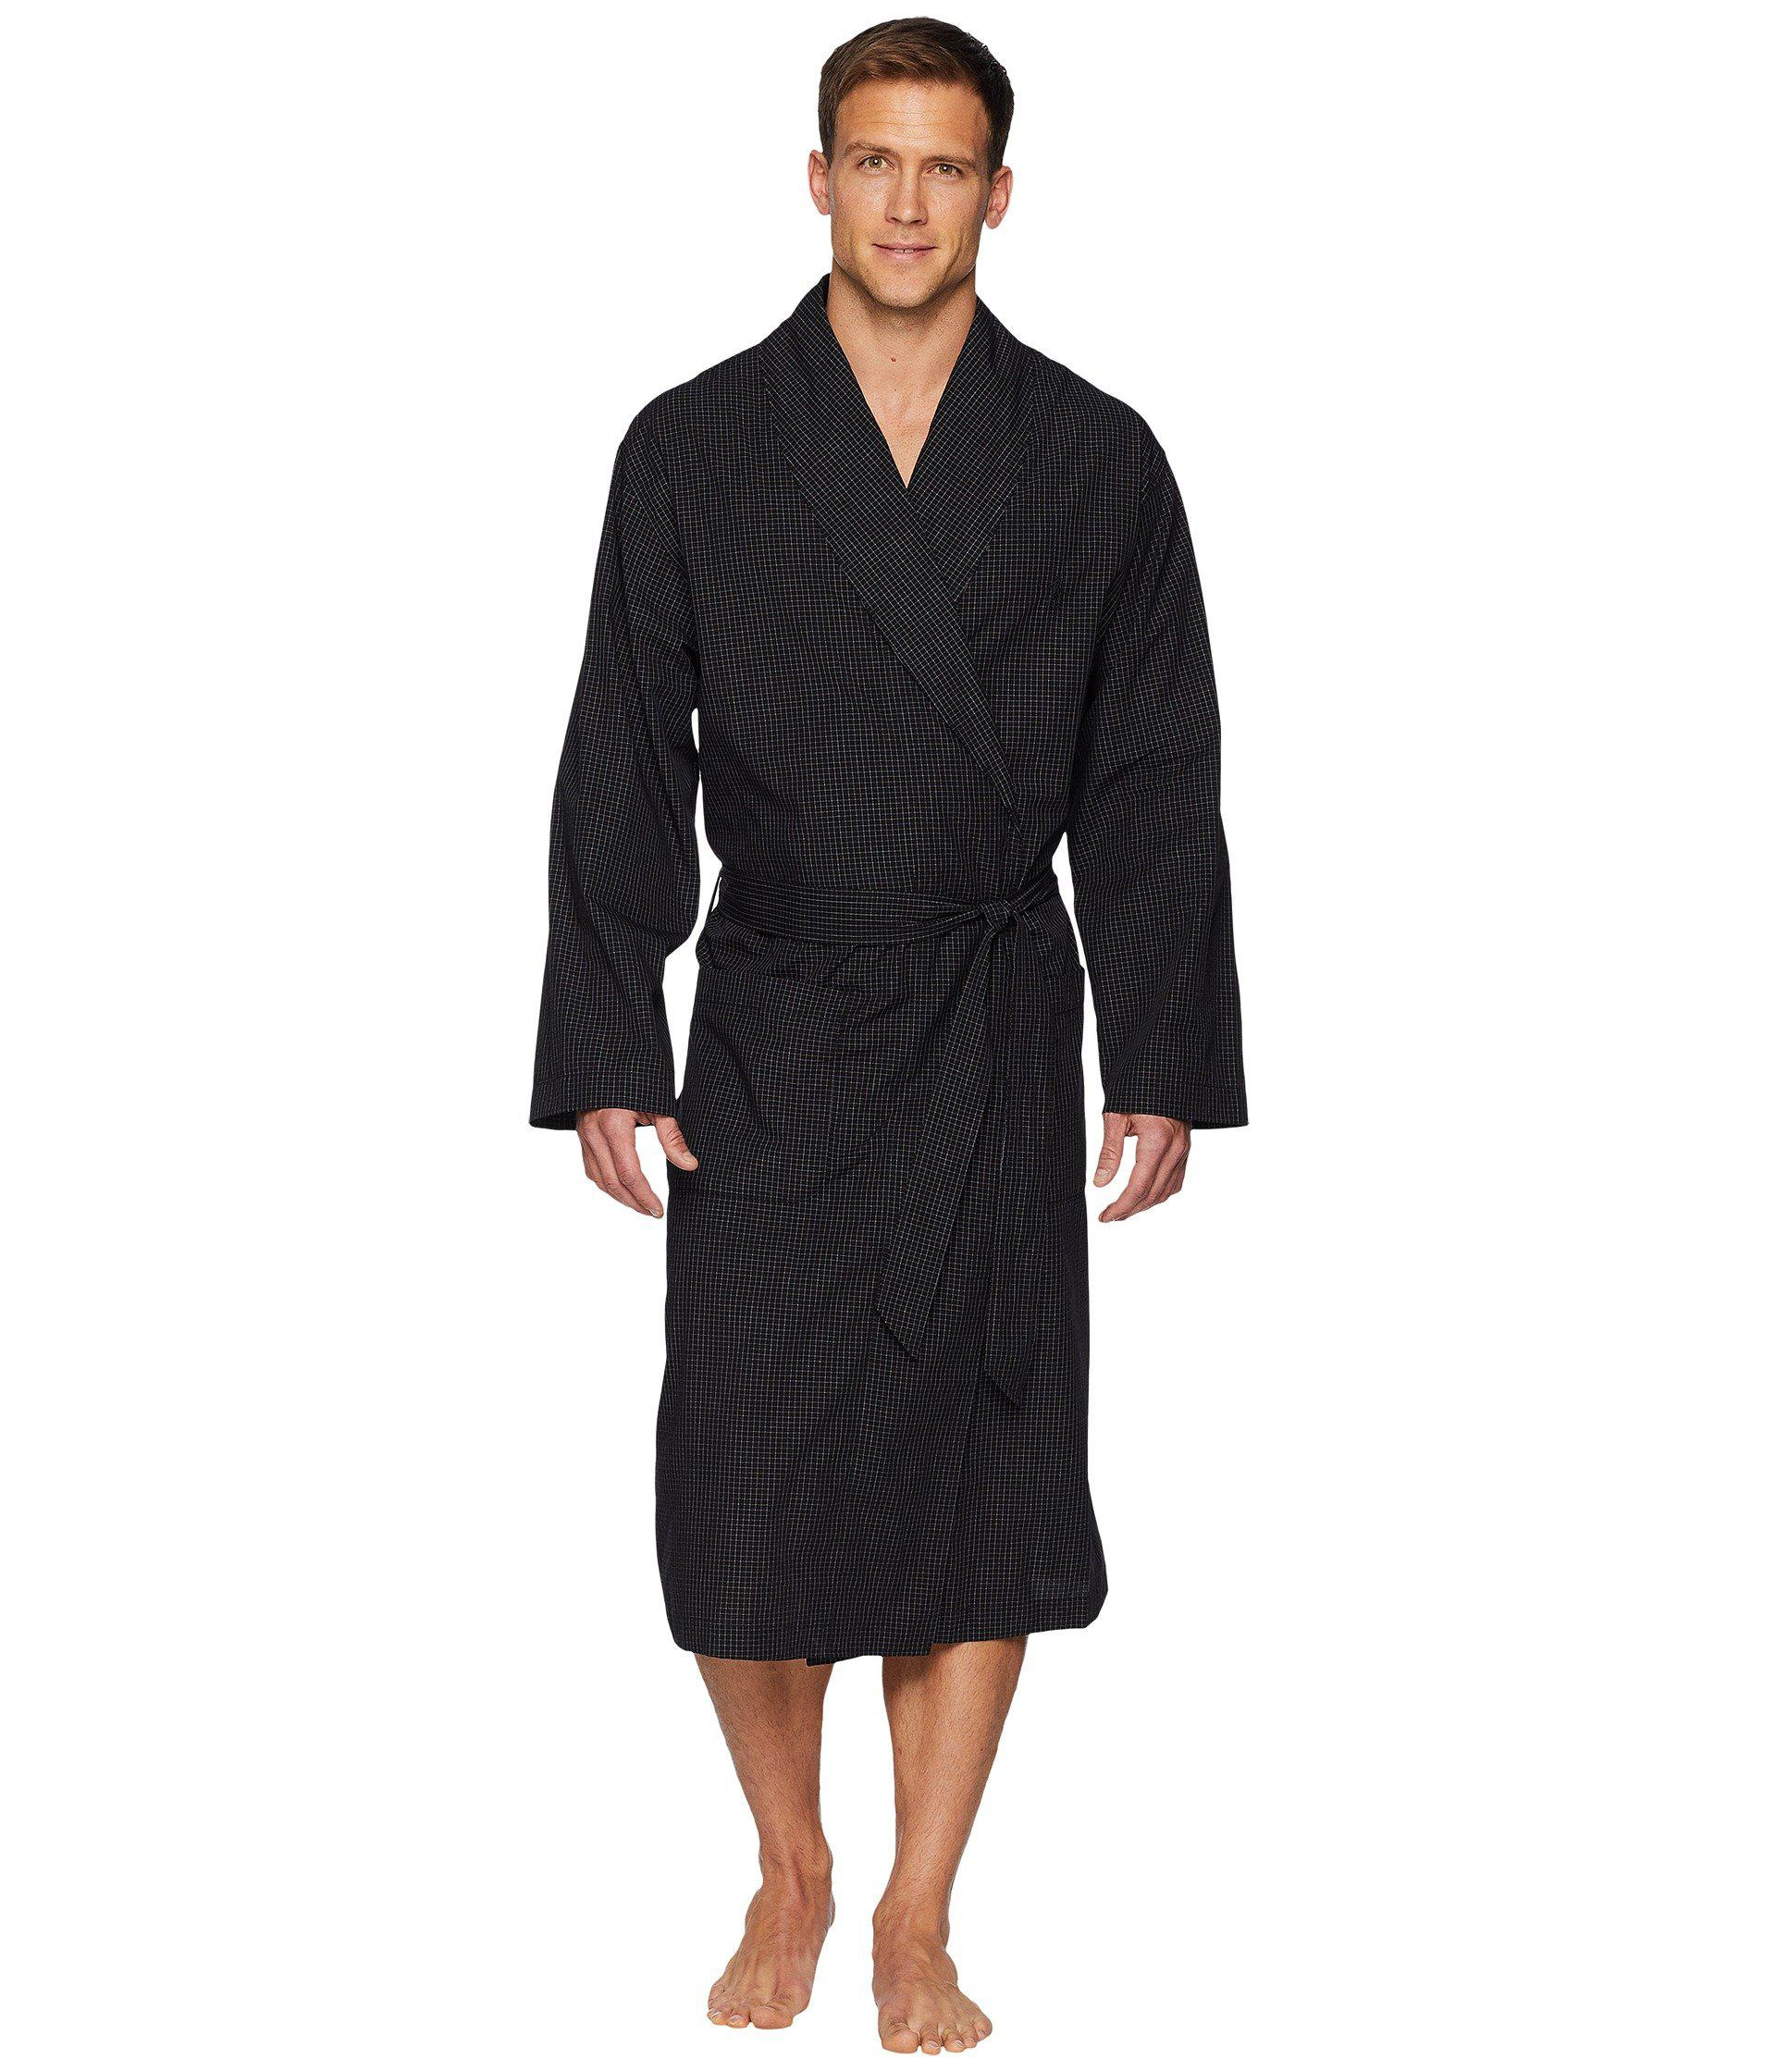 98fb38fabf7 Polo Ralph Lauren - Black Woven Robe (harwick Plaid) Men s Robe for Men -.  View fullscreen